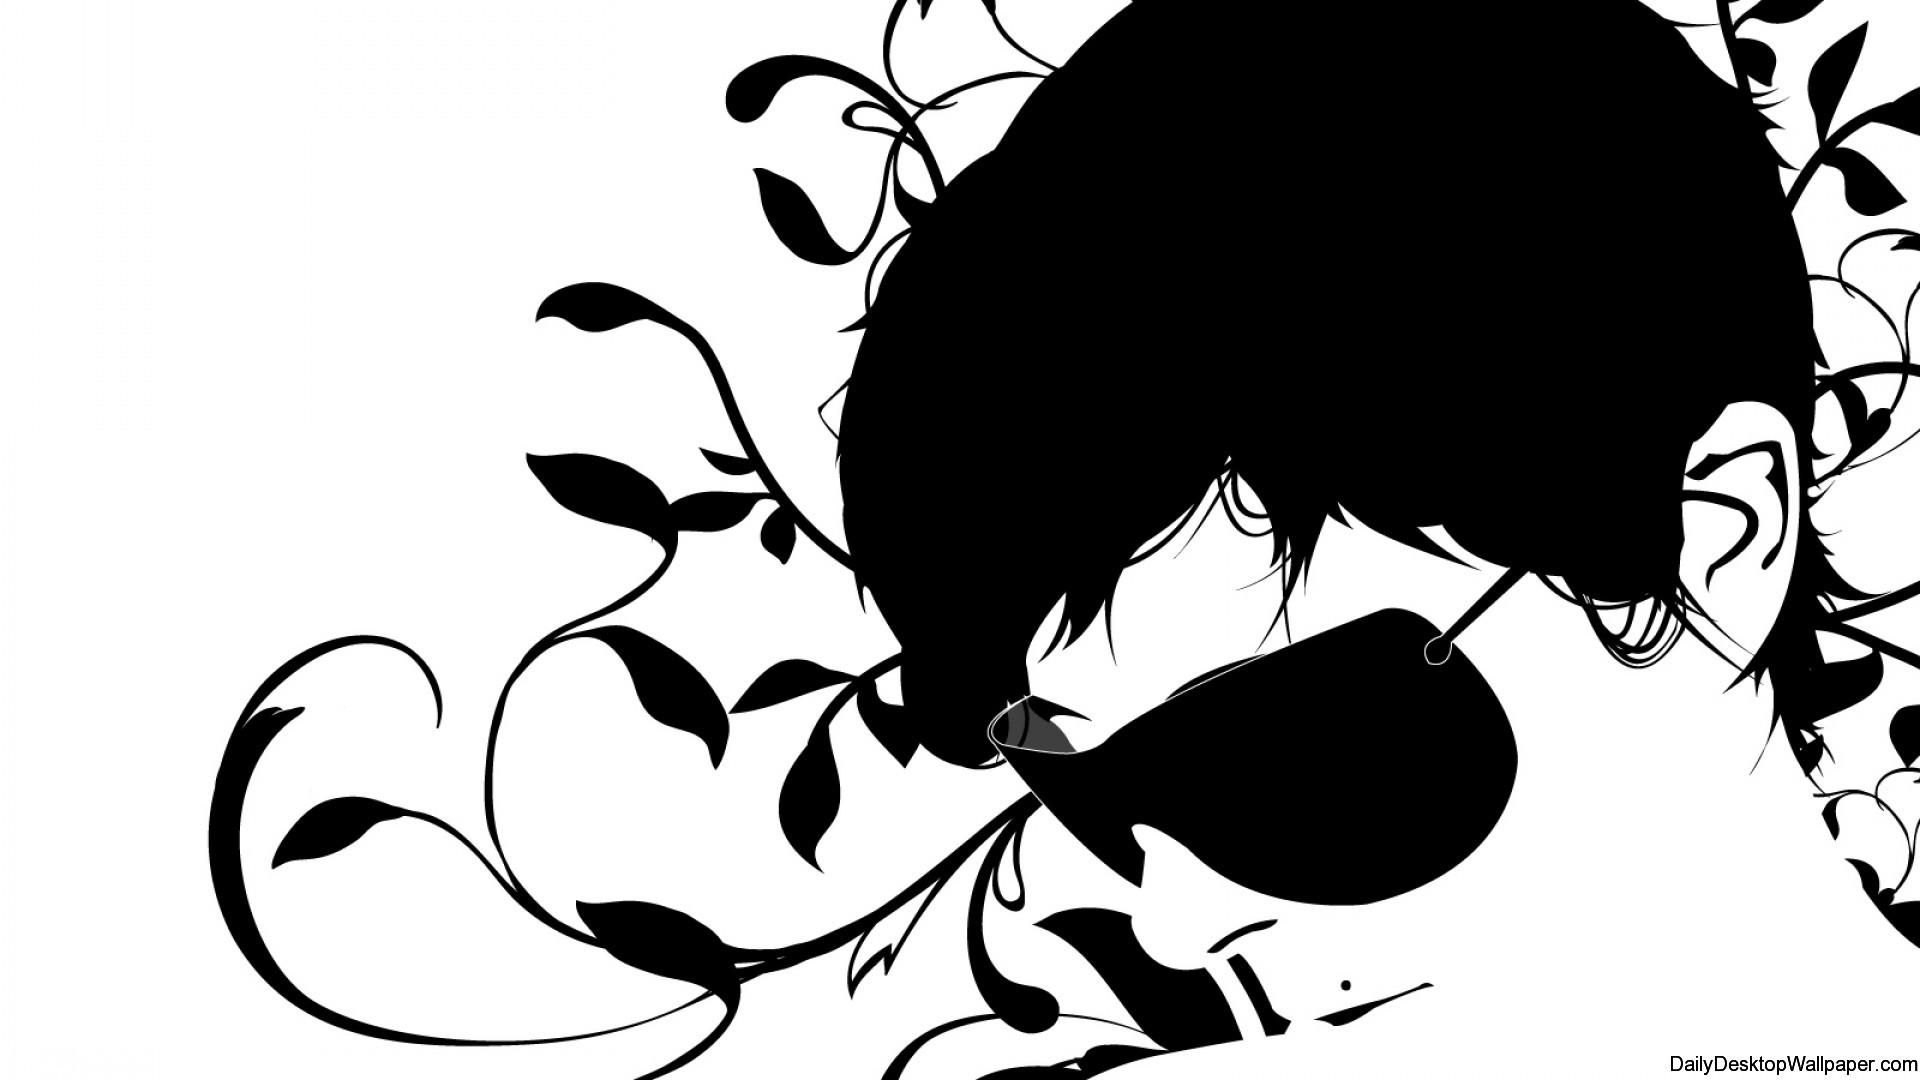 Black and white face illustration